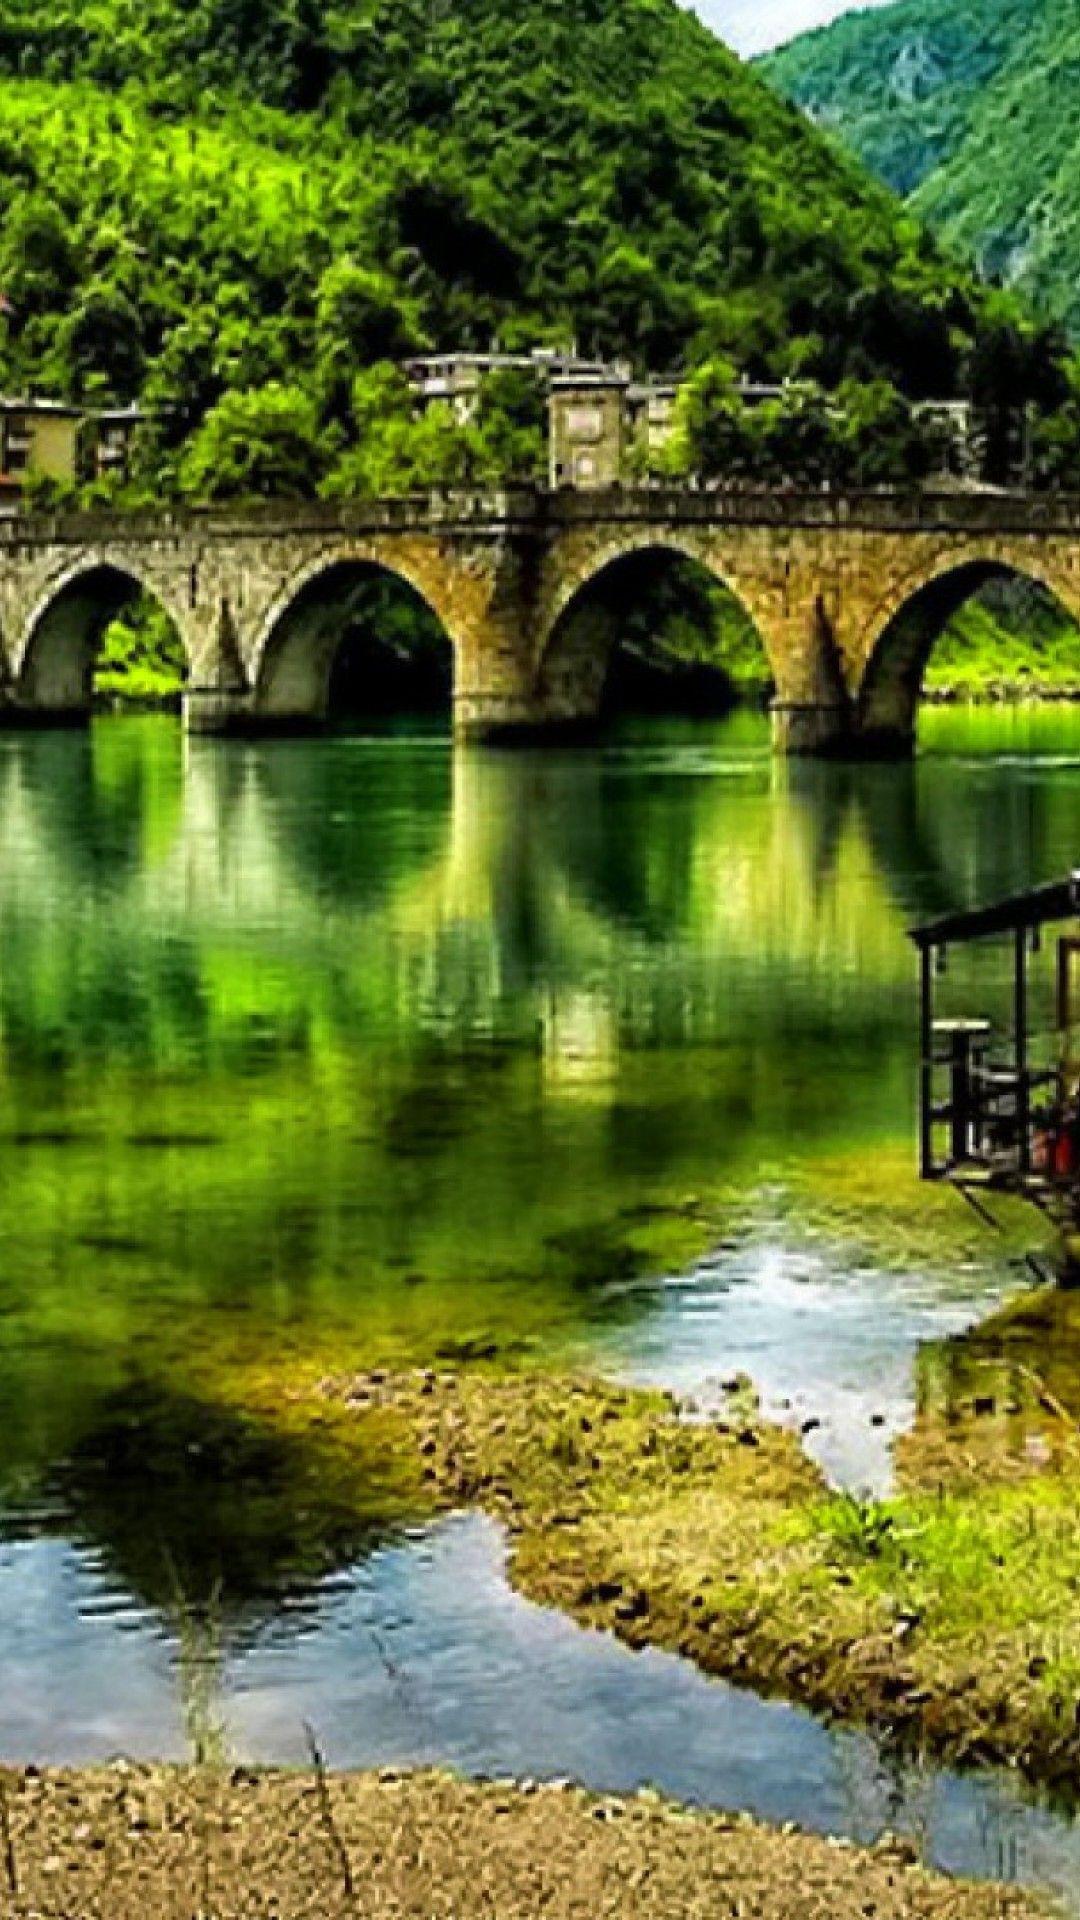 The Visegrad Bridge In Bosnia And Herzegovina